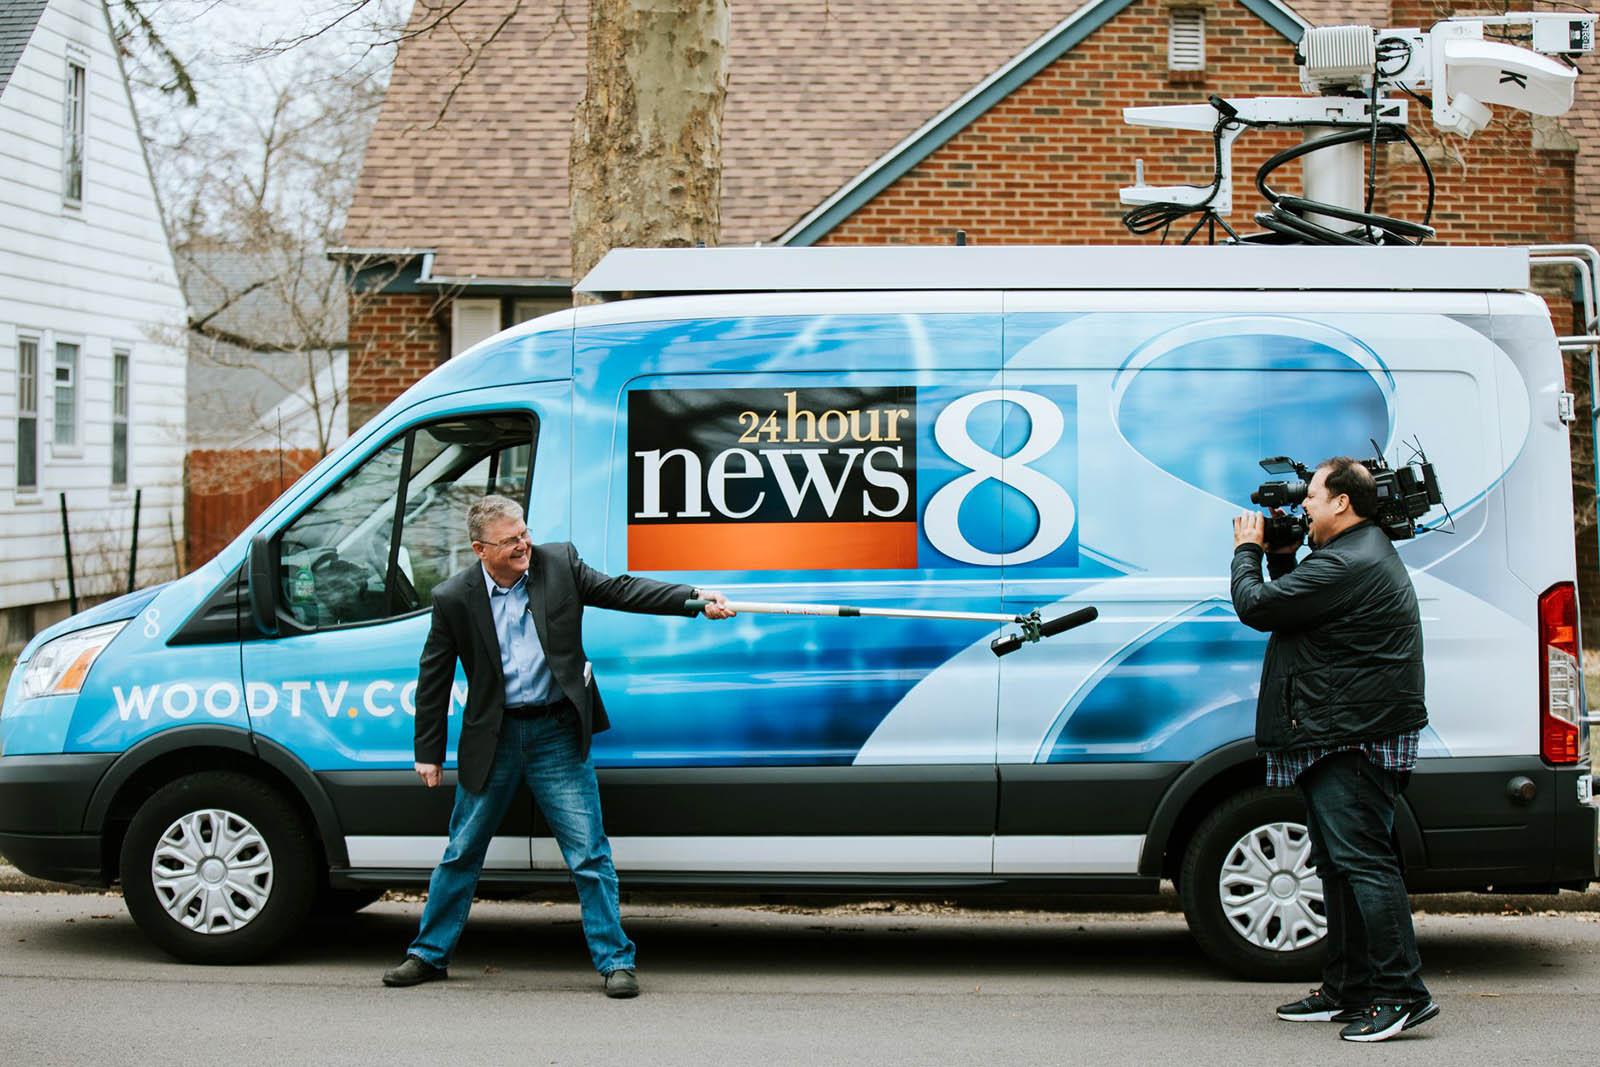 WOOD TV 8 Journalists with Satellite Van